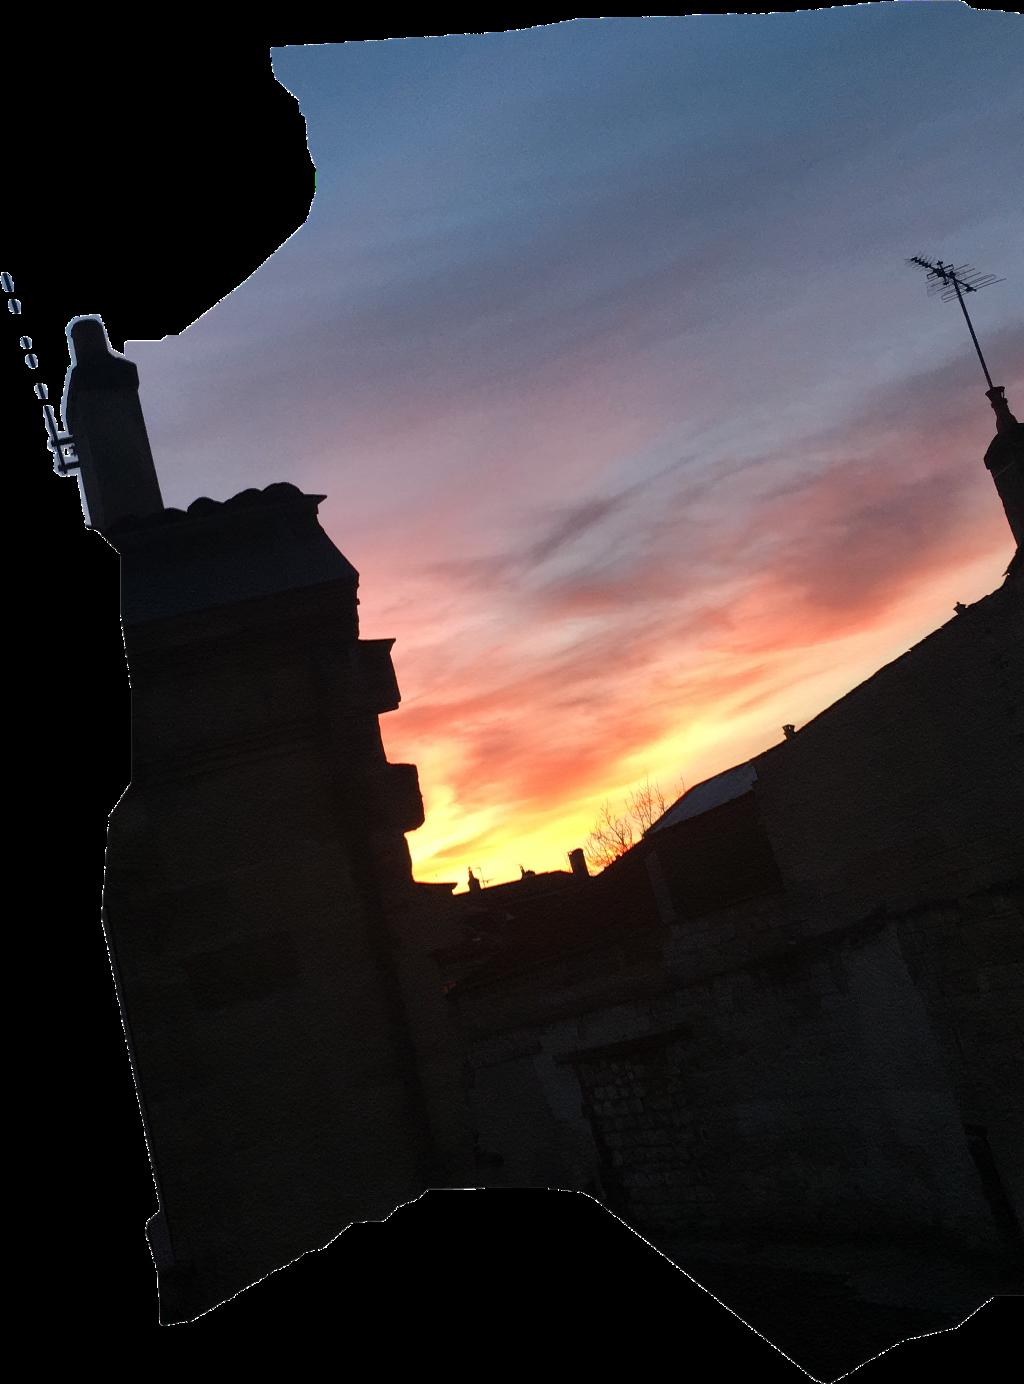 #sky #photography #freetoedit